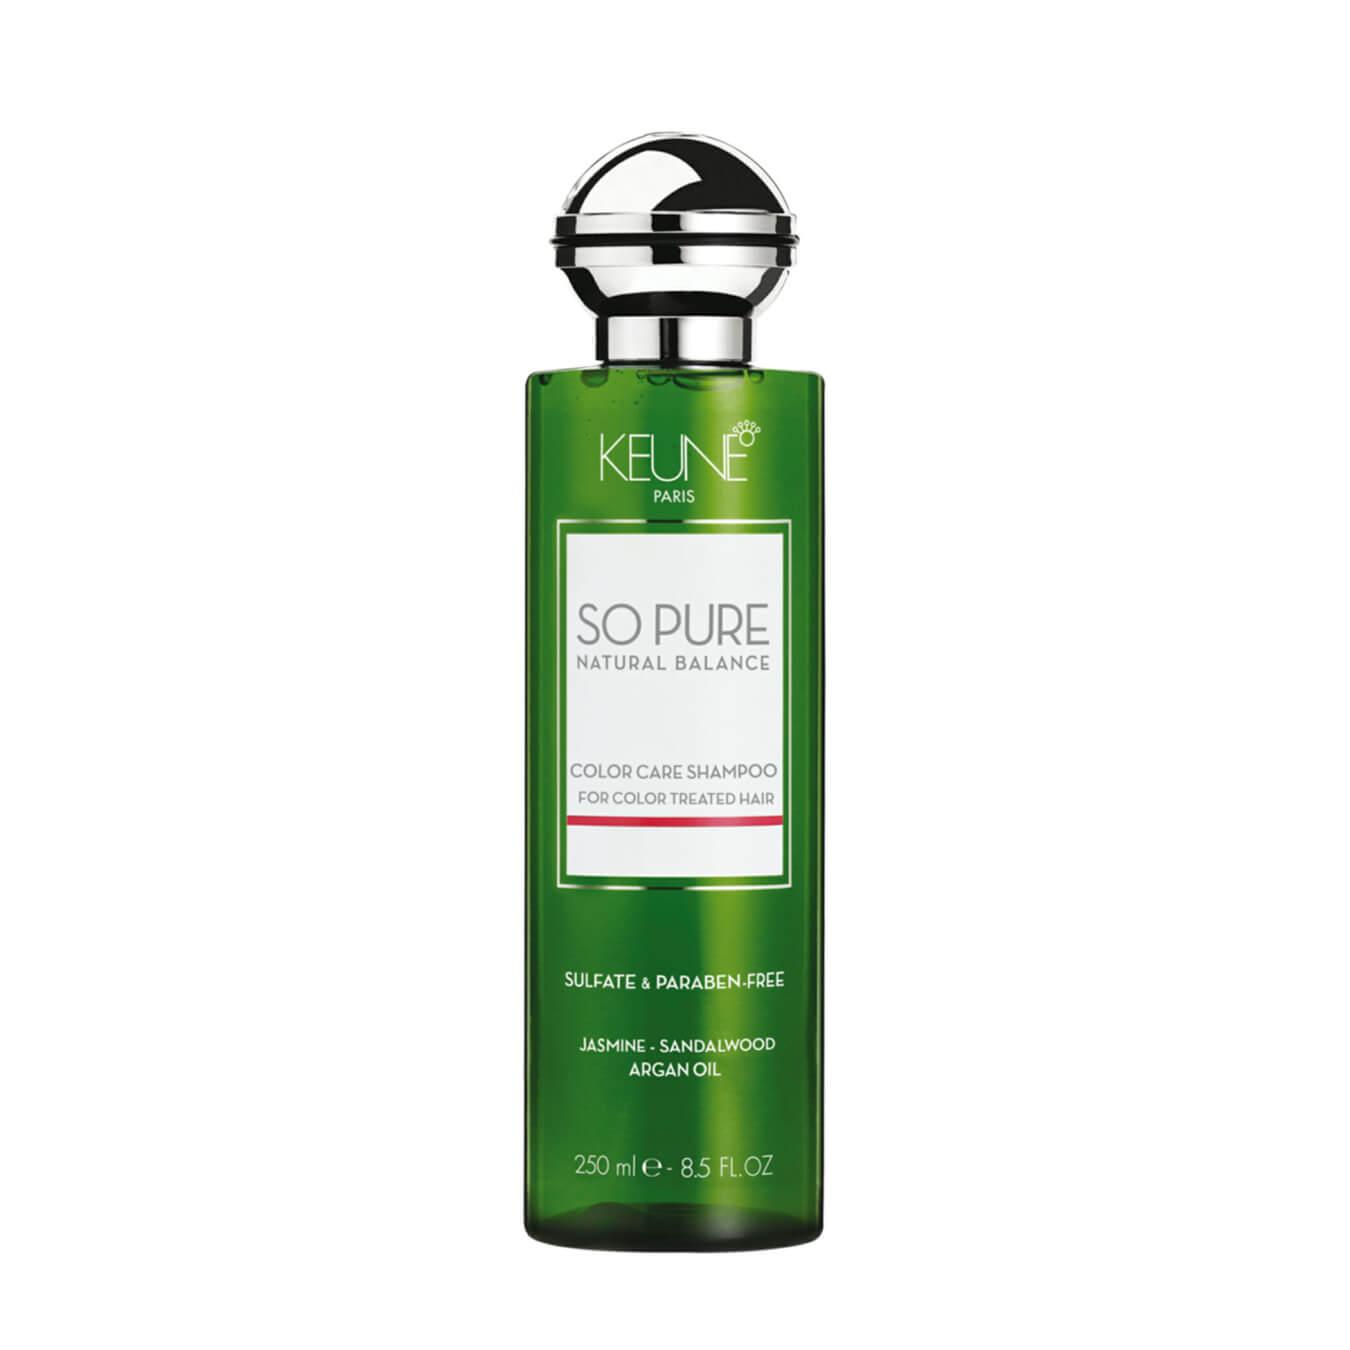 Koop Keune So Pure Color Care Shampoo 250ml